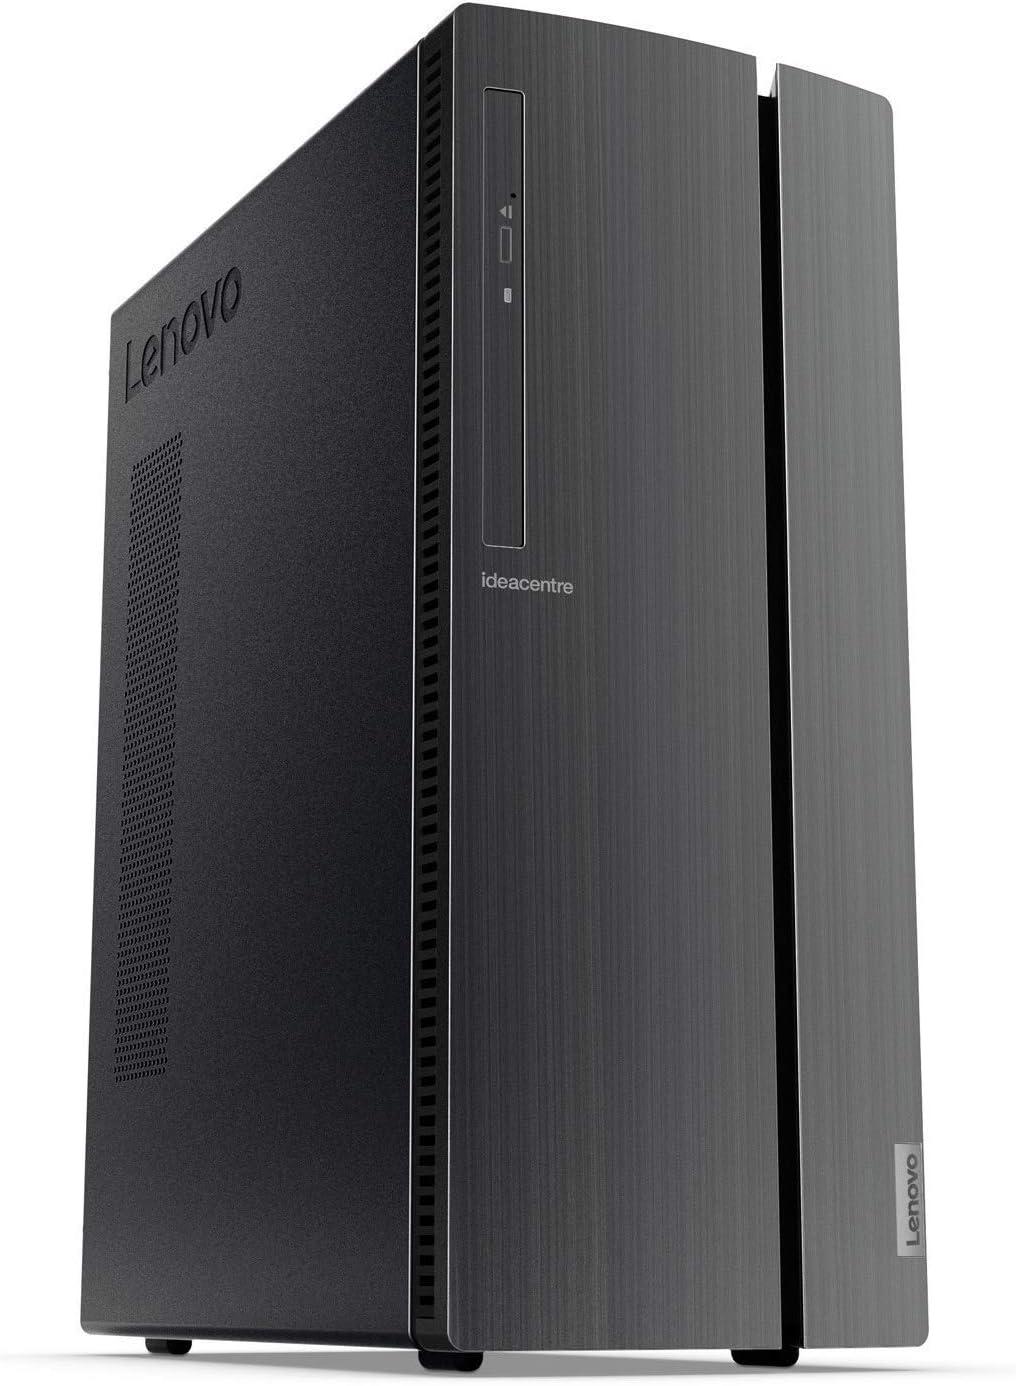 Lenovo IdeaCentre Desktop AMD A12-9800 X4 3.8GHz 12GB 1TB, Black (Certified Refurbished)